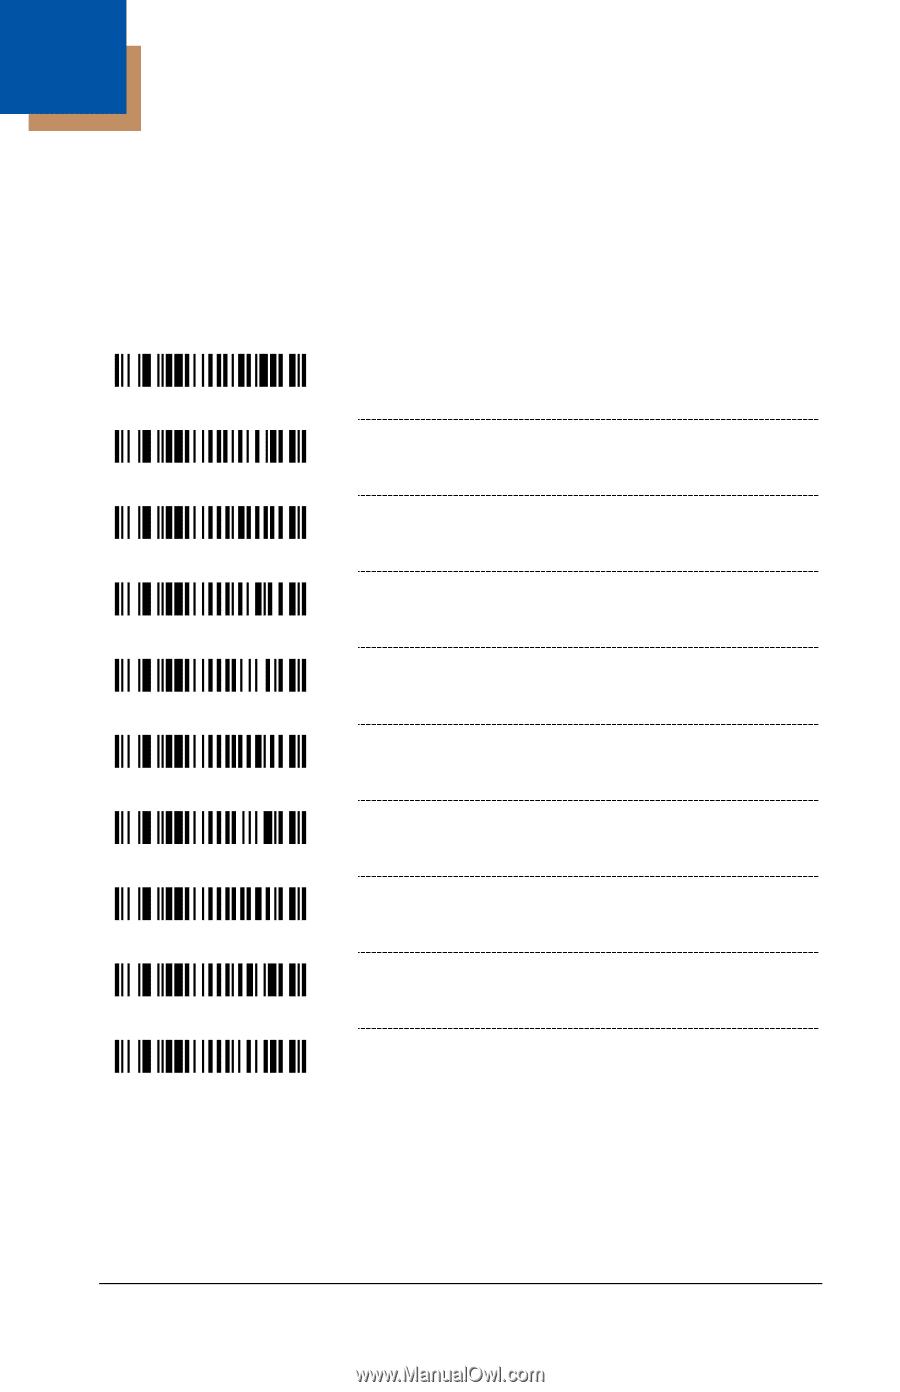 honeywell ms9540 38 3 configuration guide rh manualowl com Honeywell Barcode Reader Barcode Scanner Honeywell Voyager